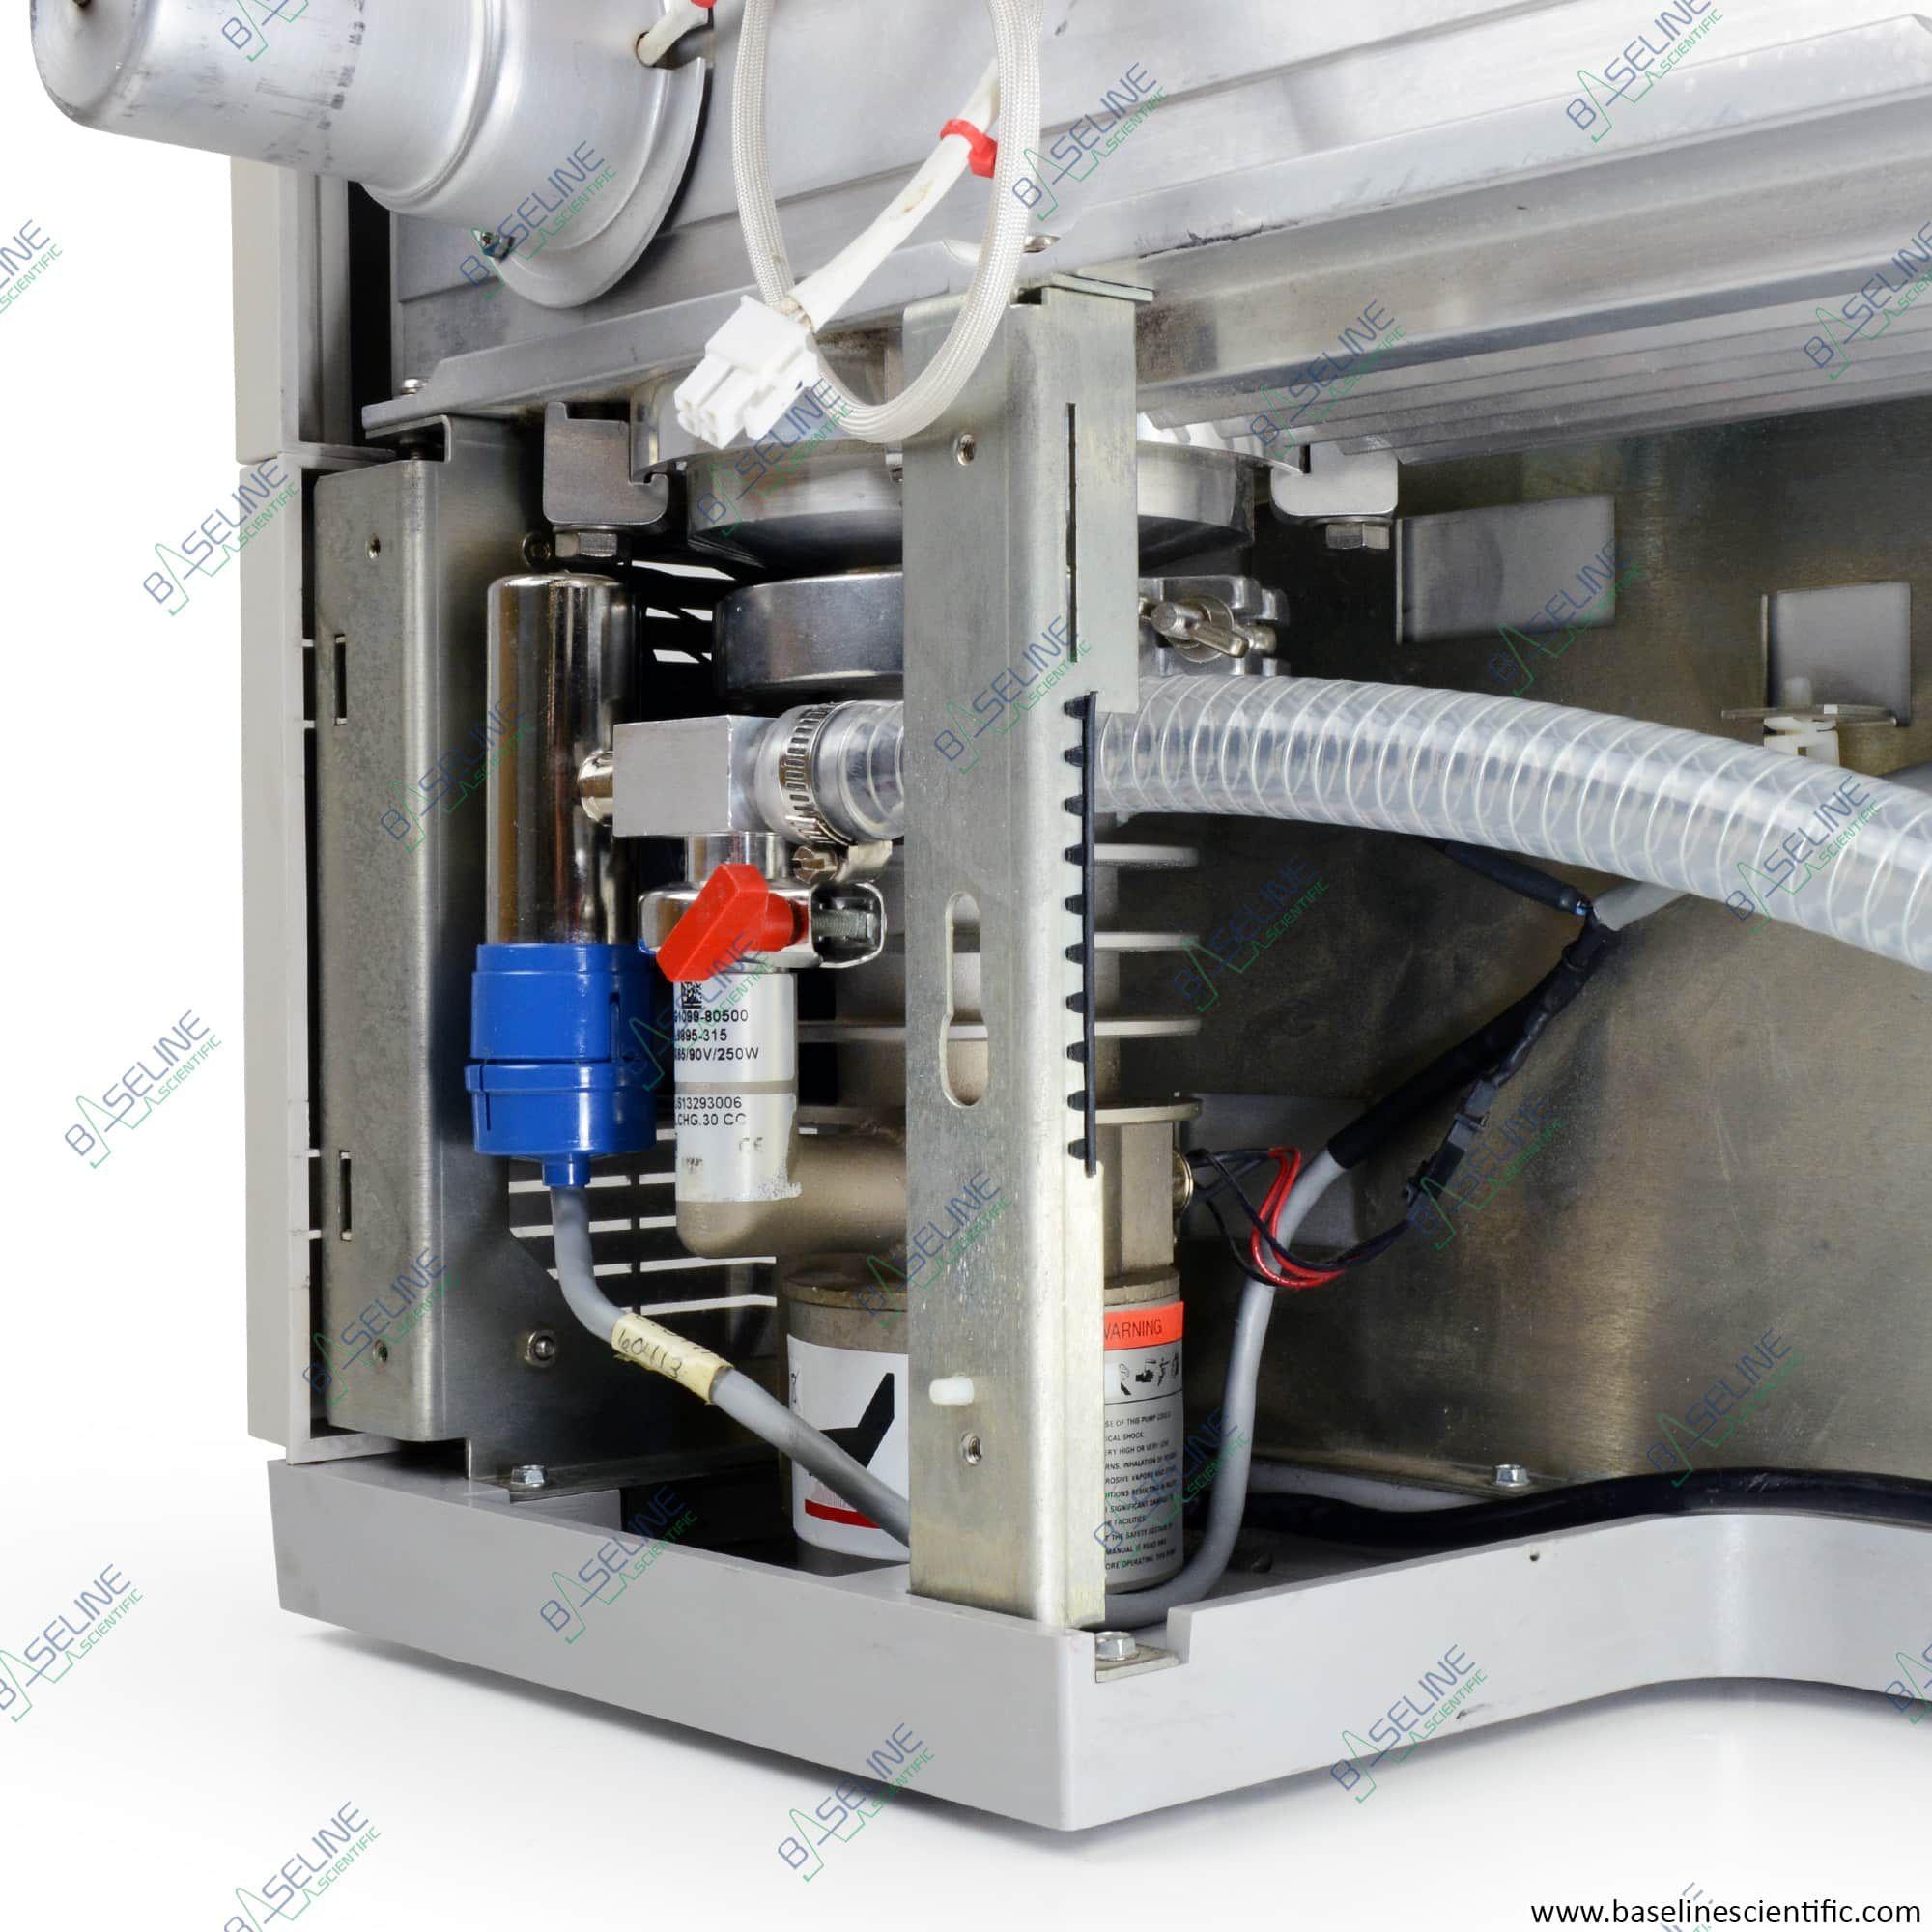 Refurbished Agilent 5973N MSD Diffusion Pump with ONE YEAR WARRANTY